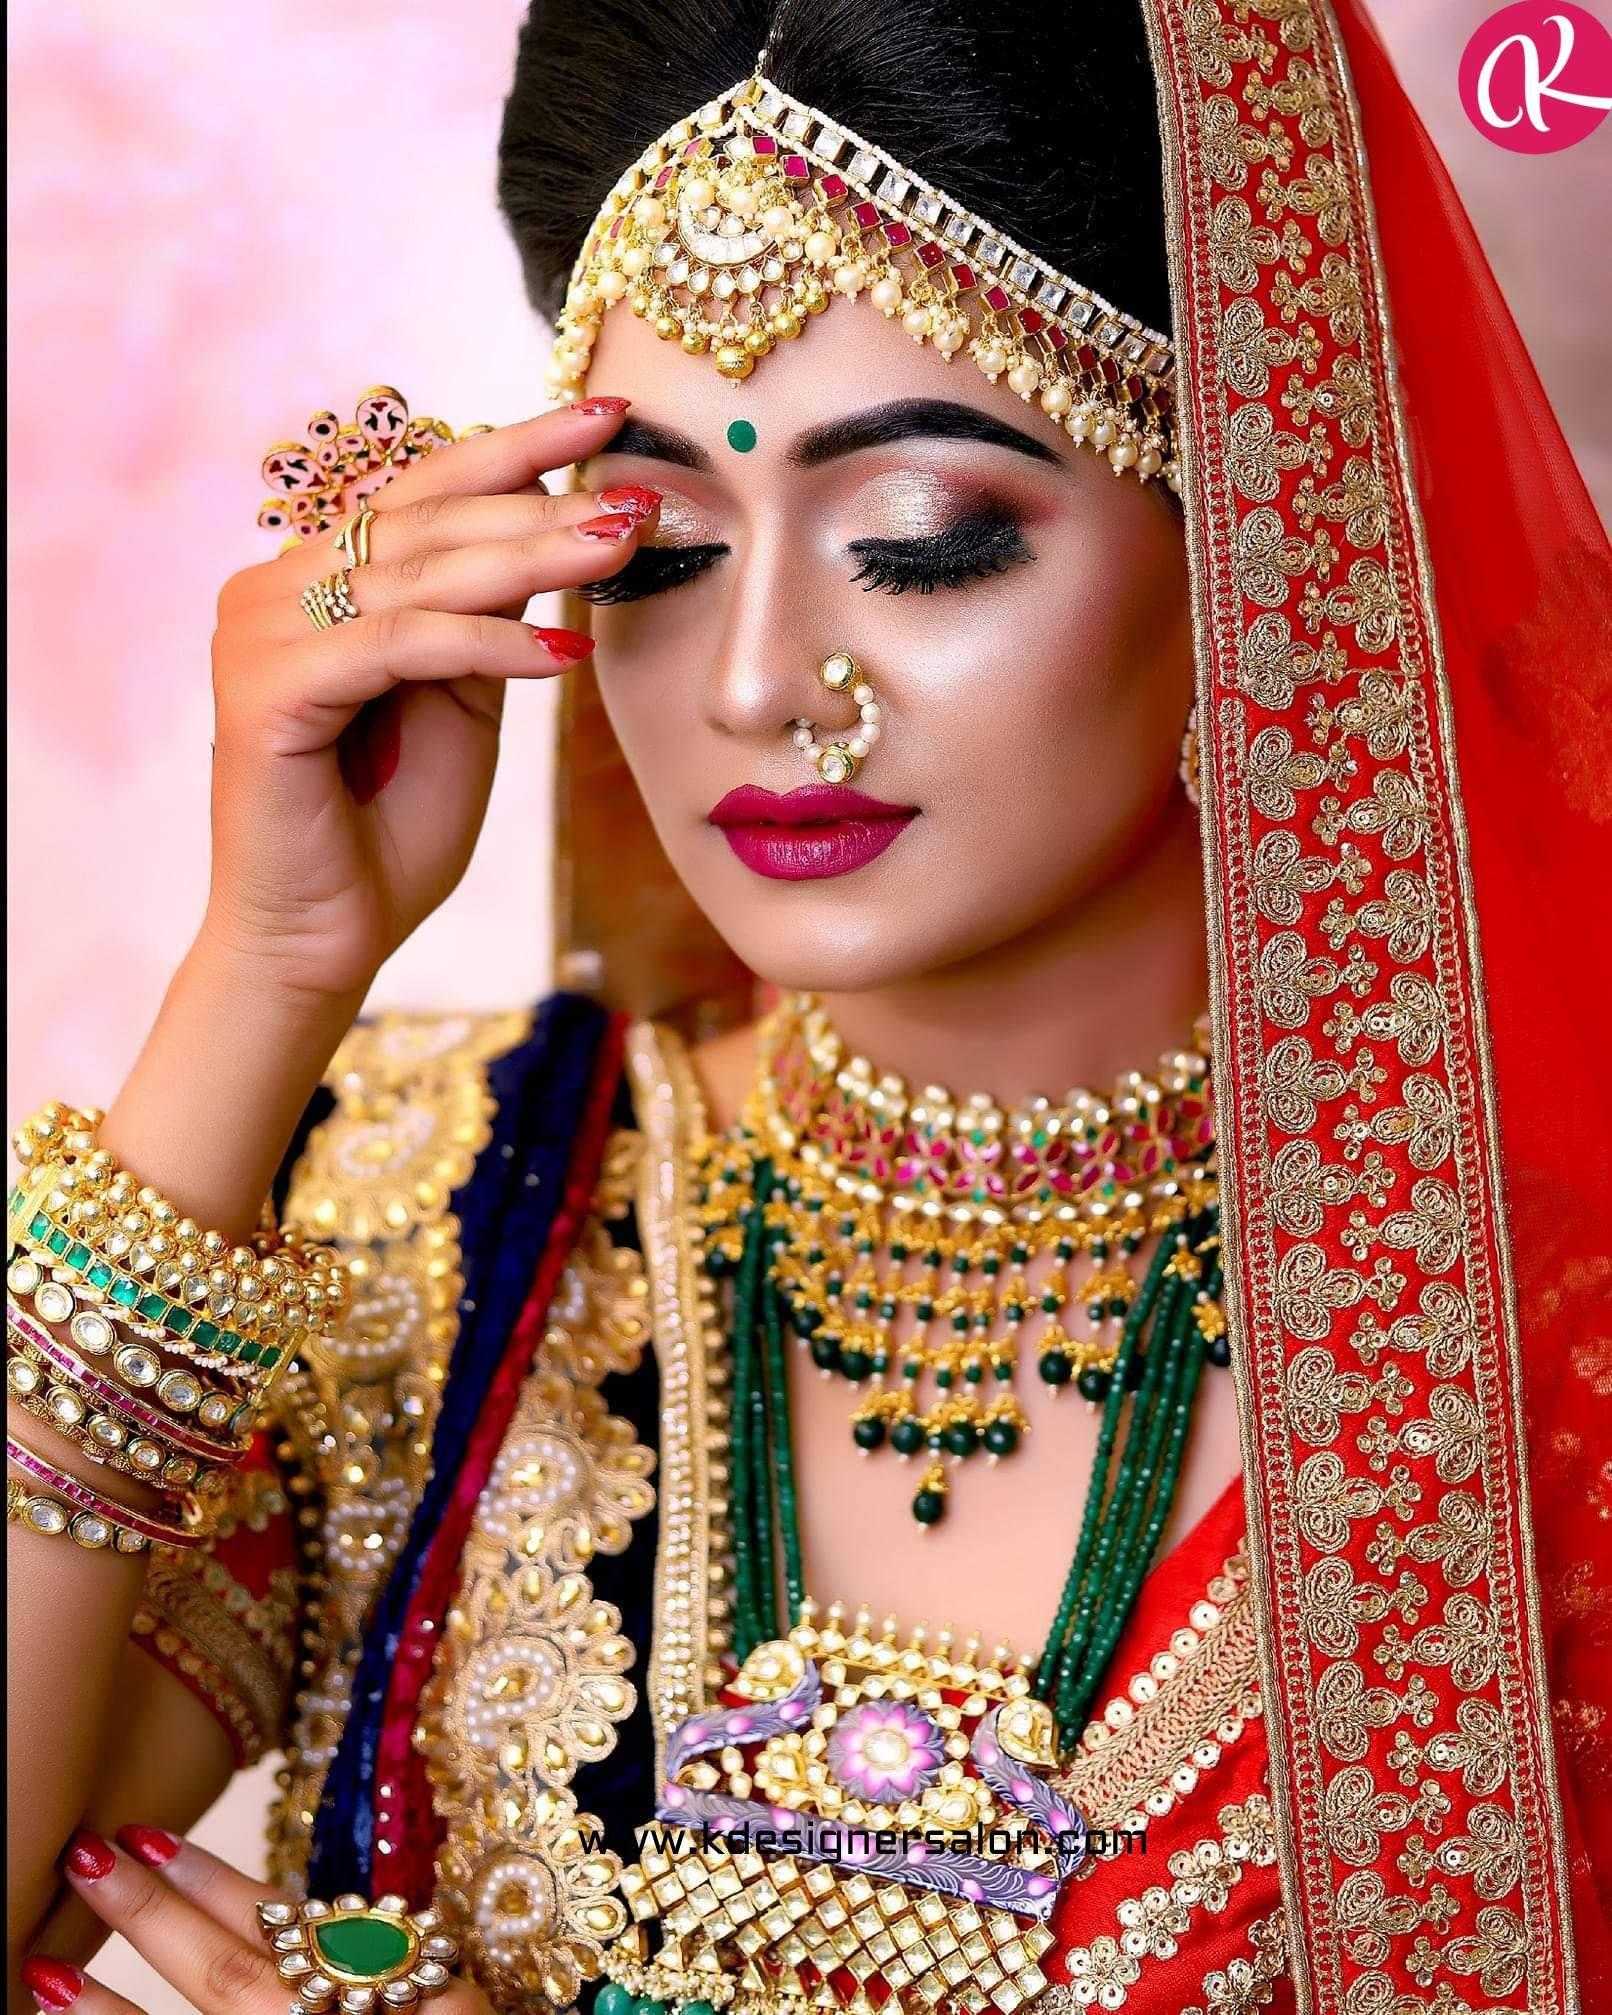 Bridal Makeup Artist in Delhi in 2020 Bridal makeup